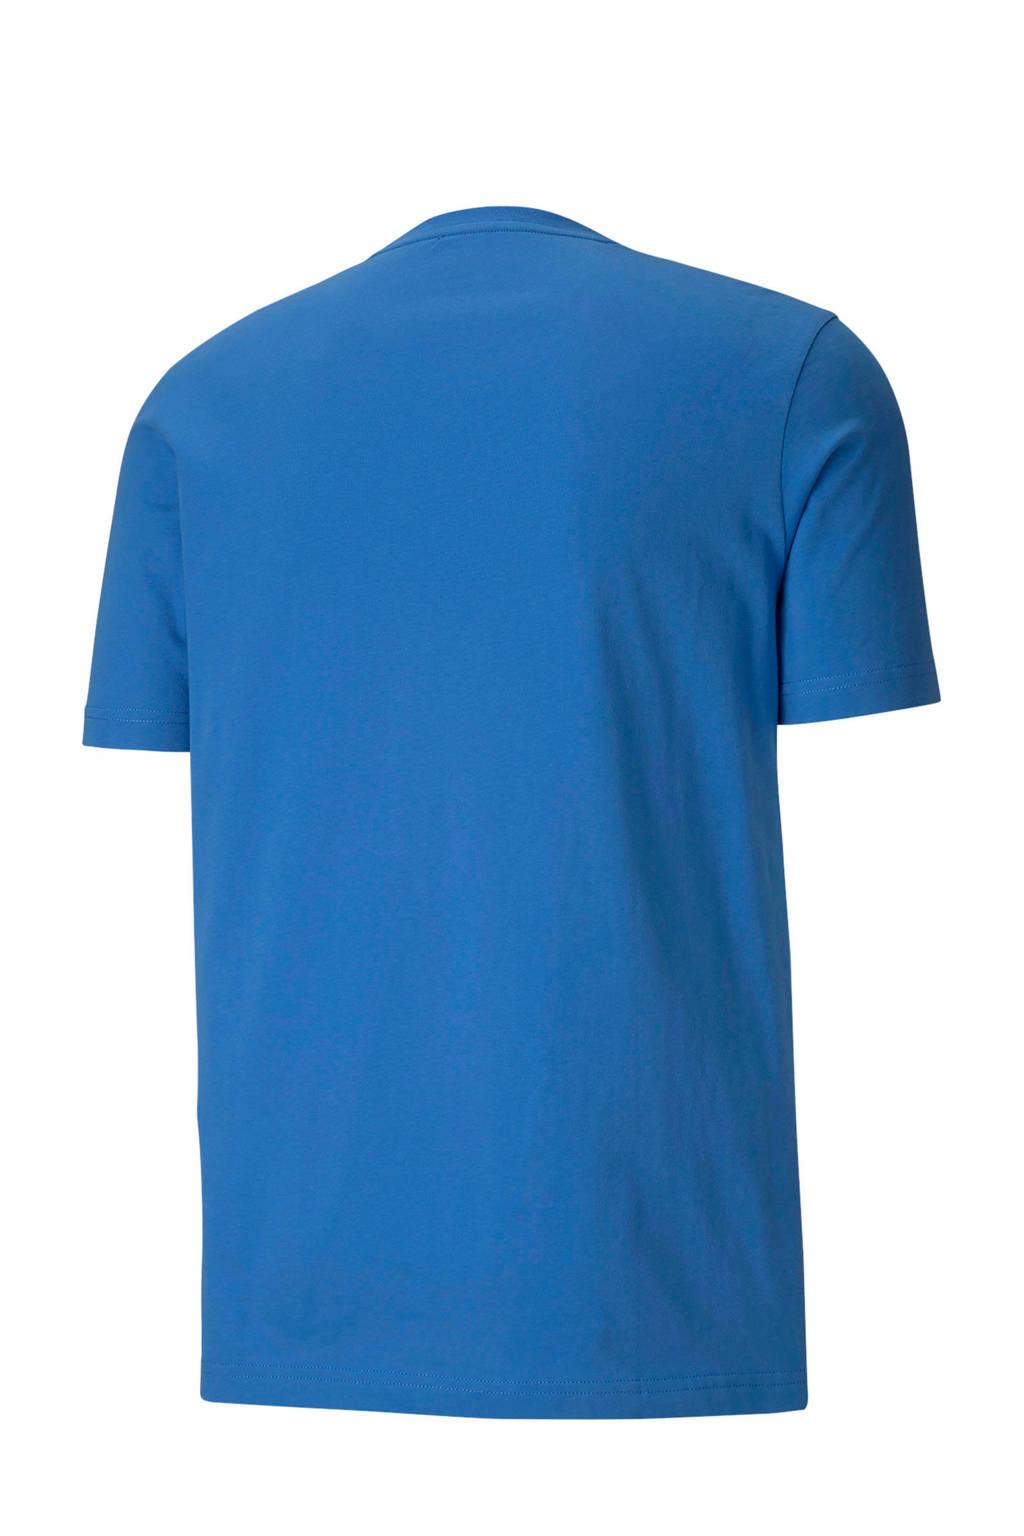 Puma   T-shirt blauw, Blauw